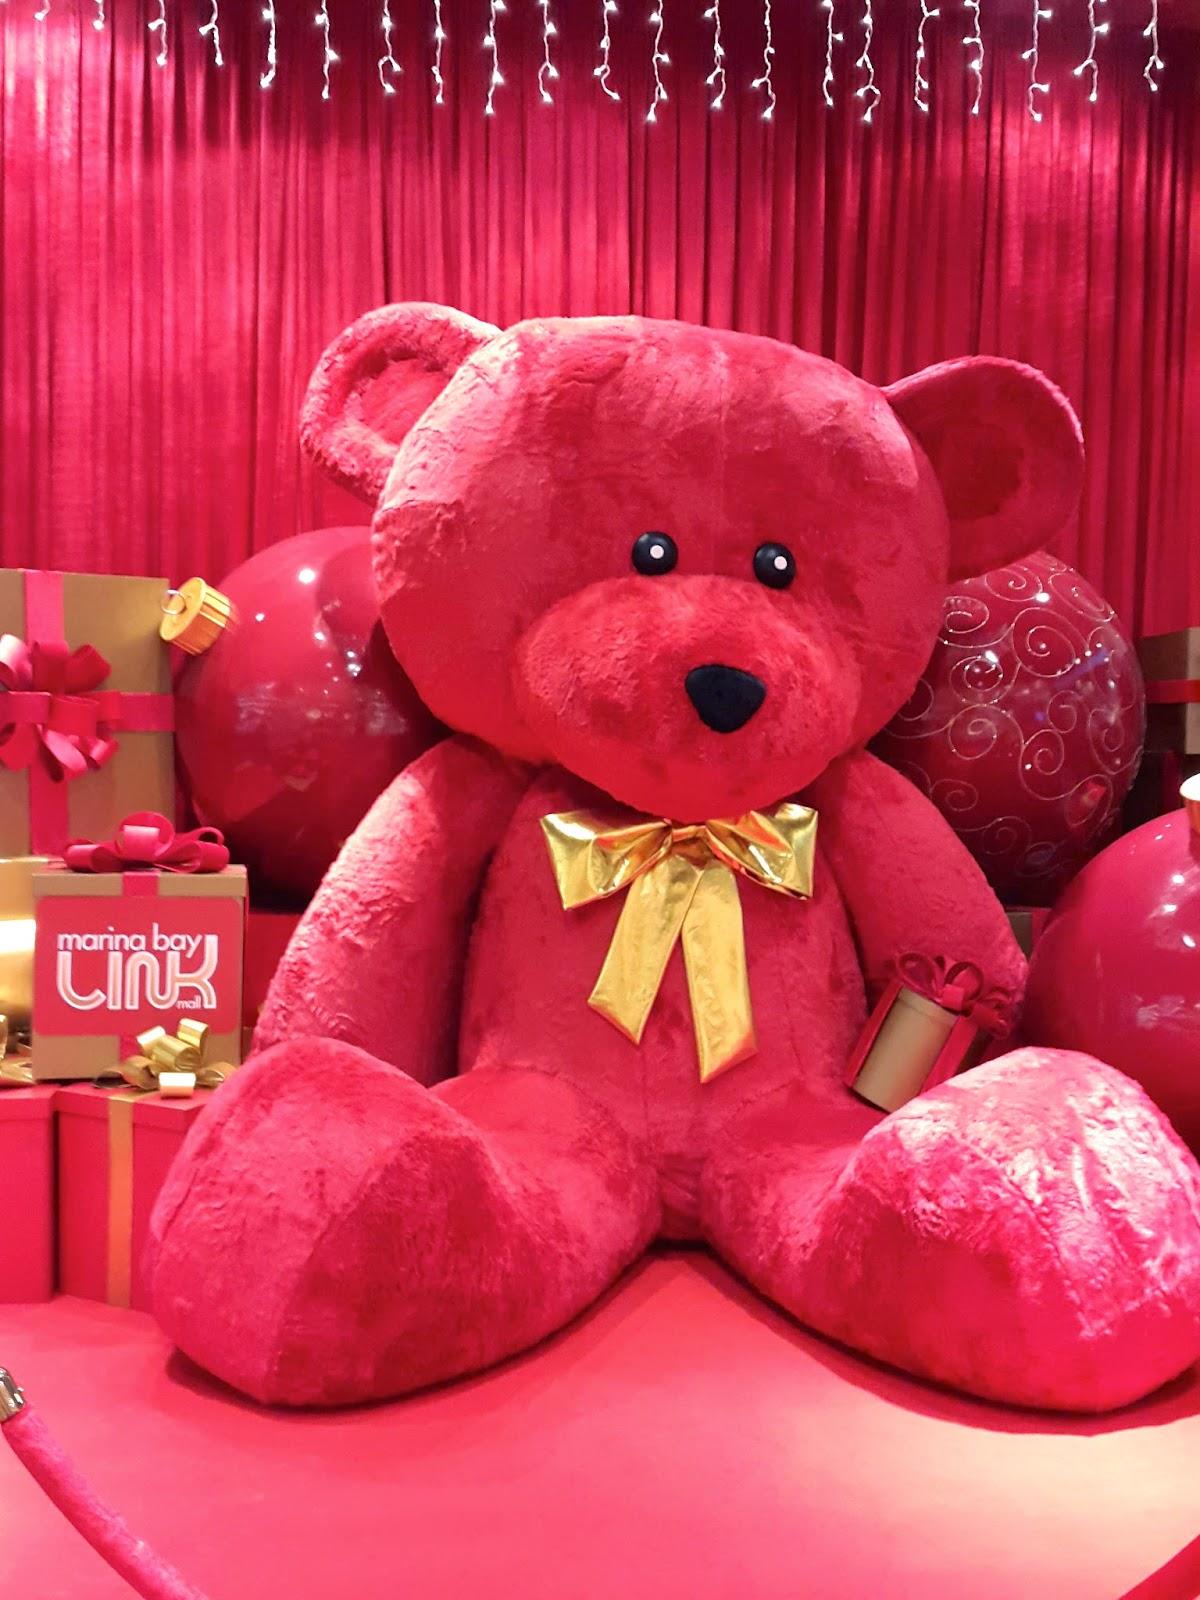 Marina Bay Link Mall Red Teddy Bear Christmas 2014 Singapore